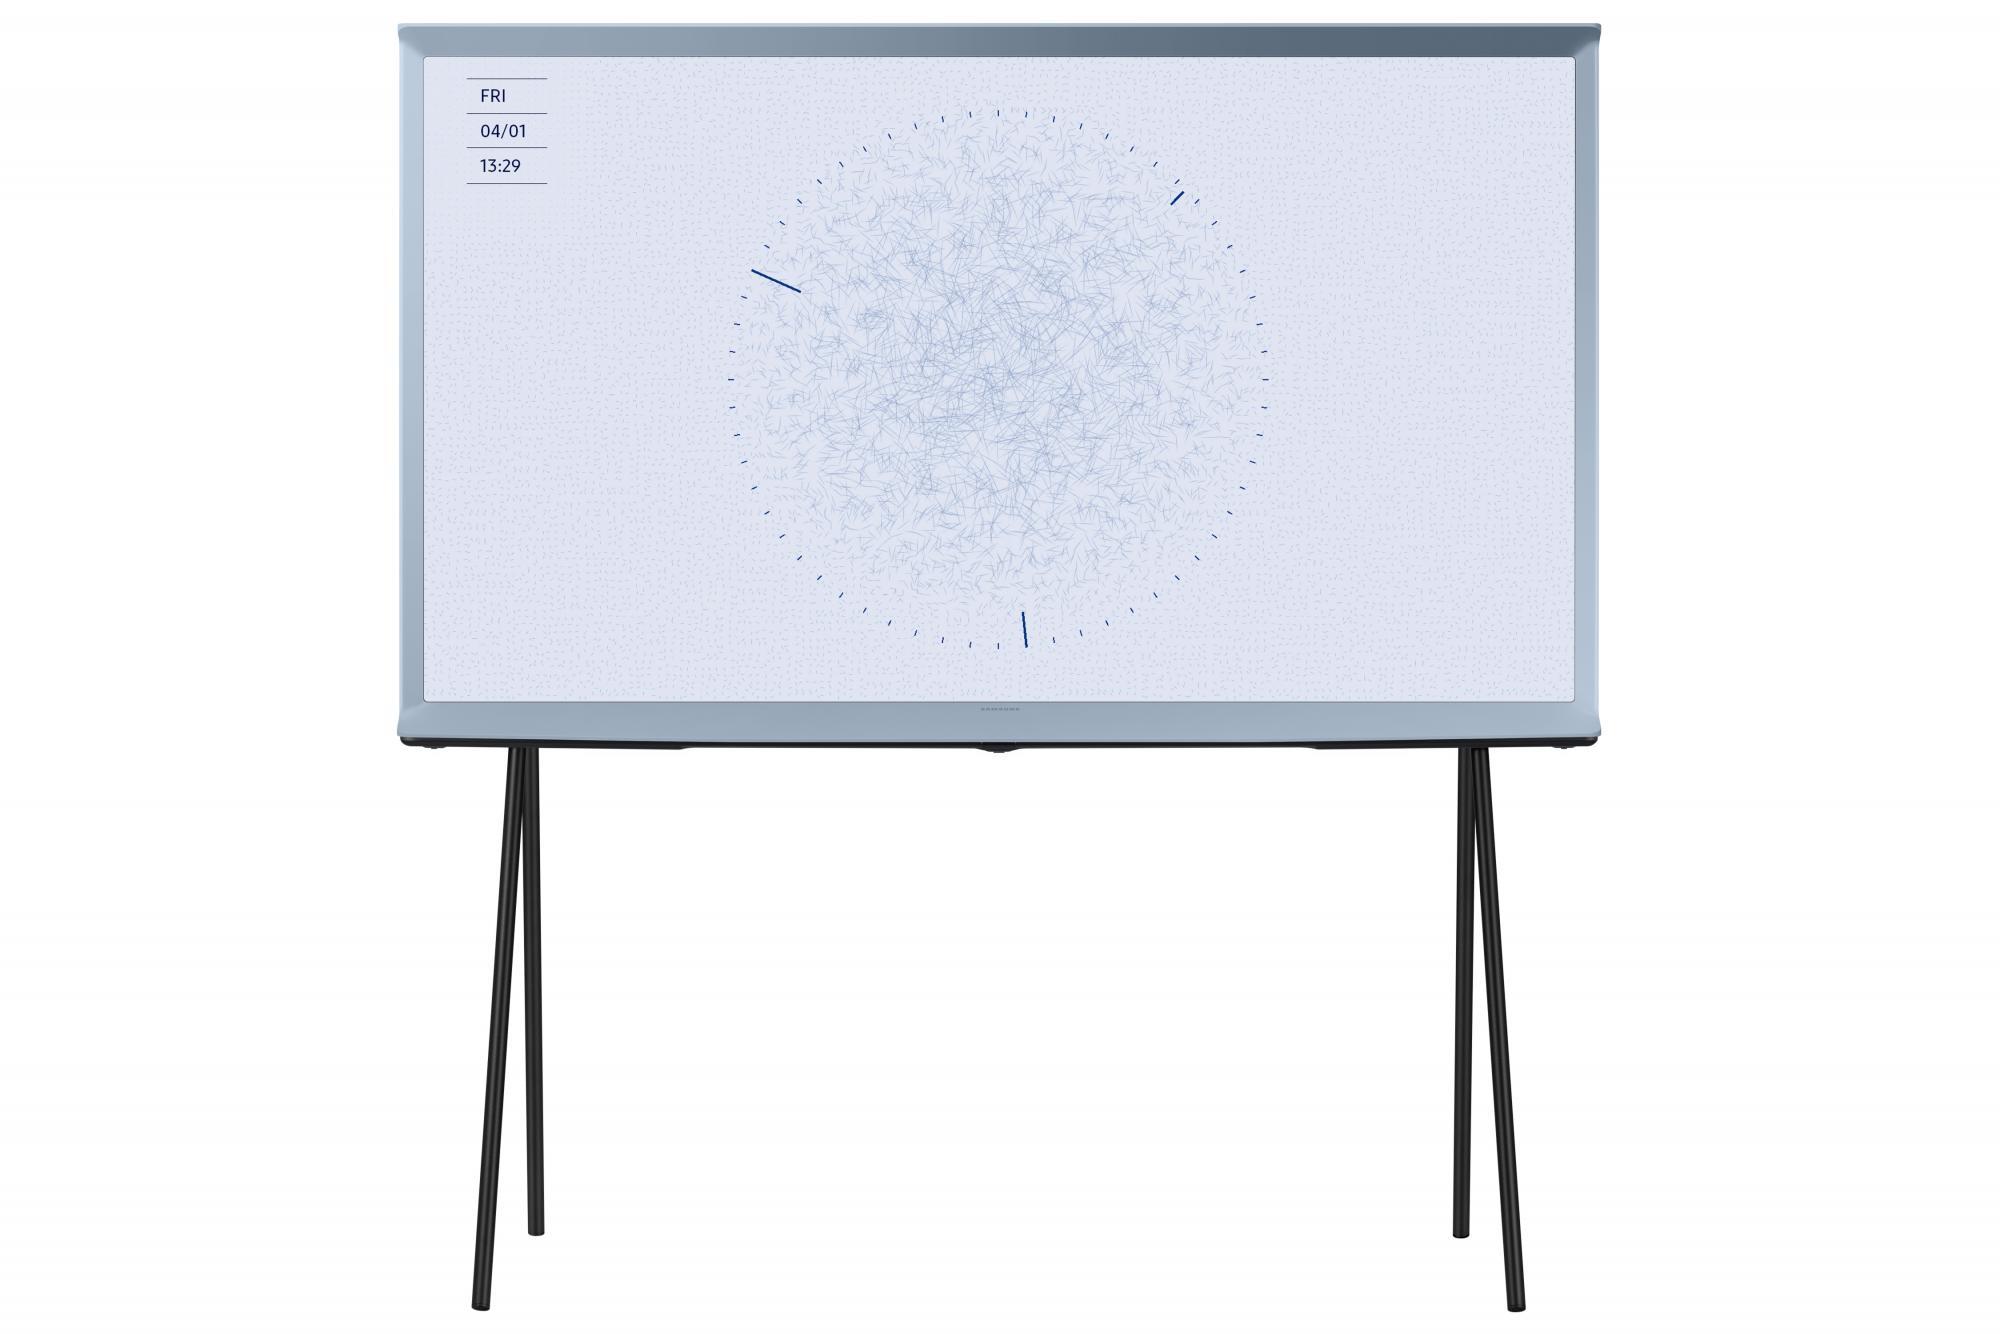 Samsung QE43LS01TB modrý  + 90 dní záruka vrátenia peňazí - QLED 4K TV monitor